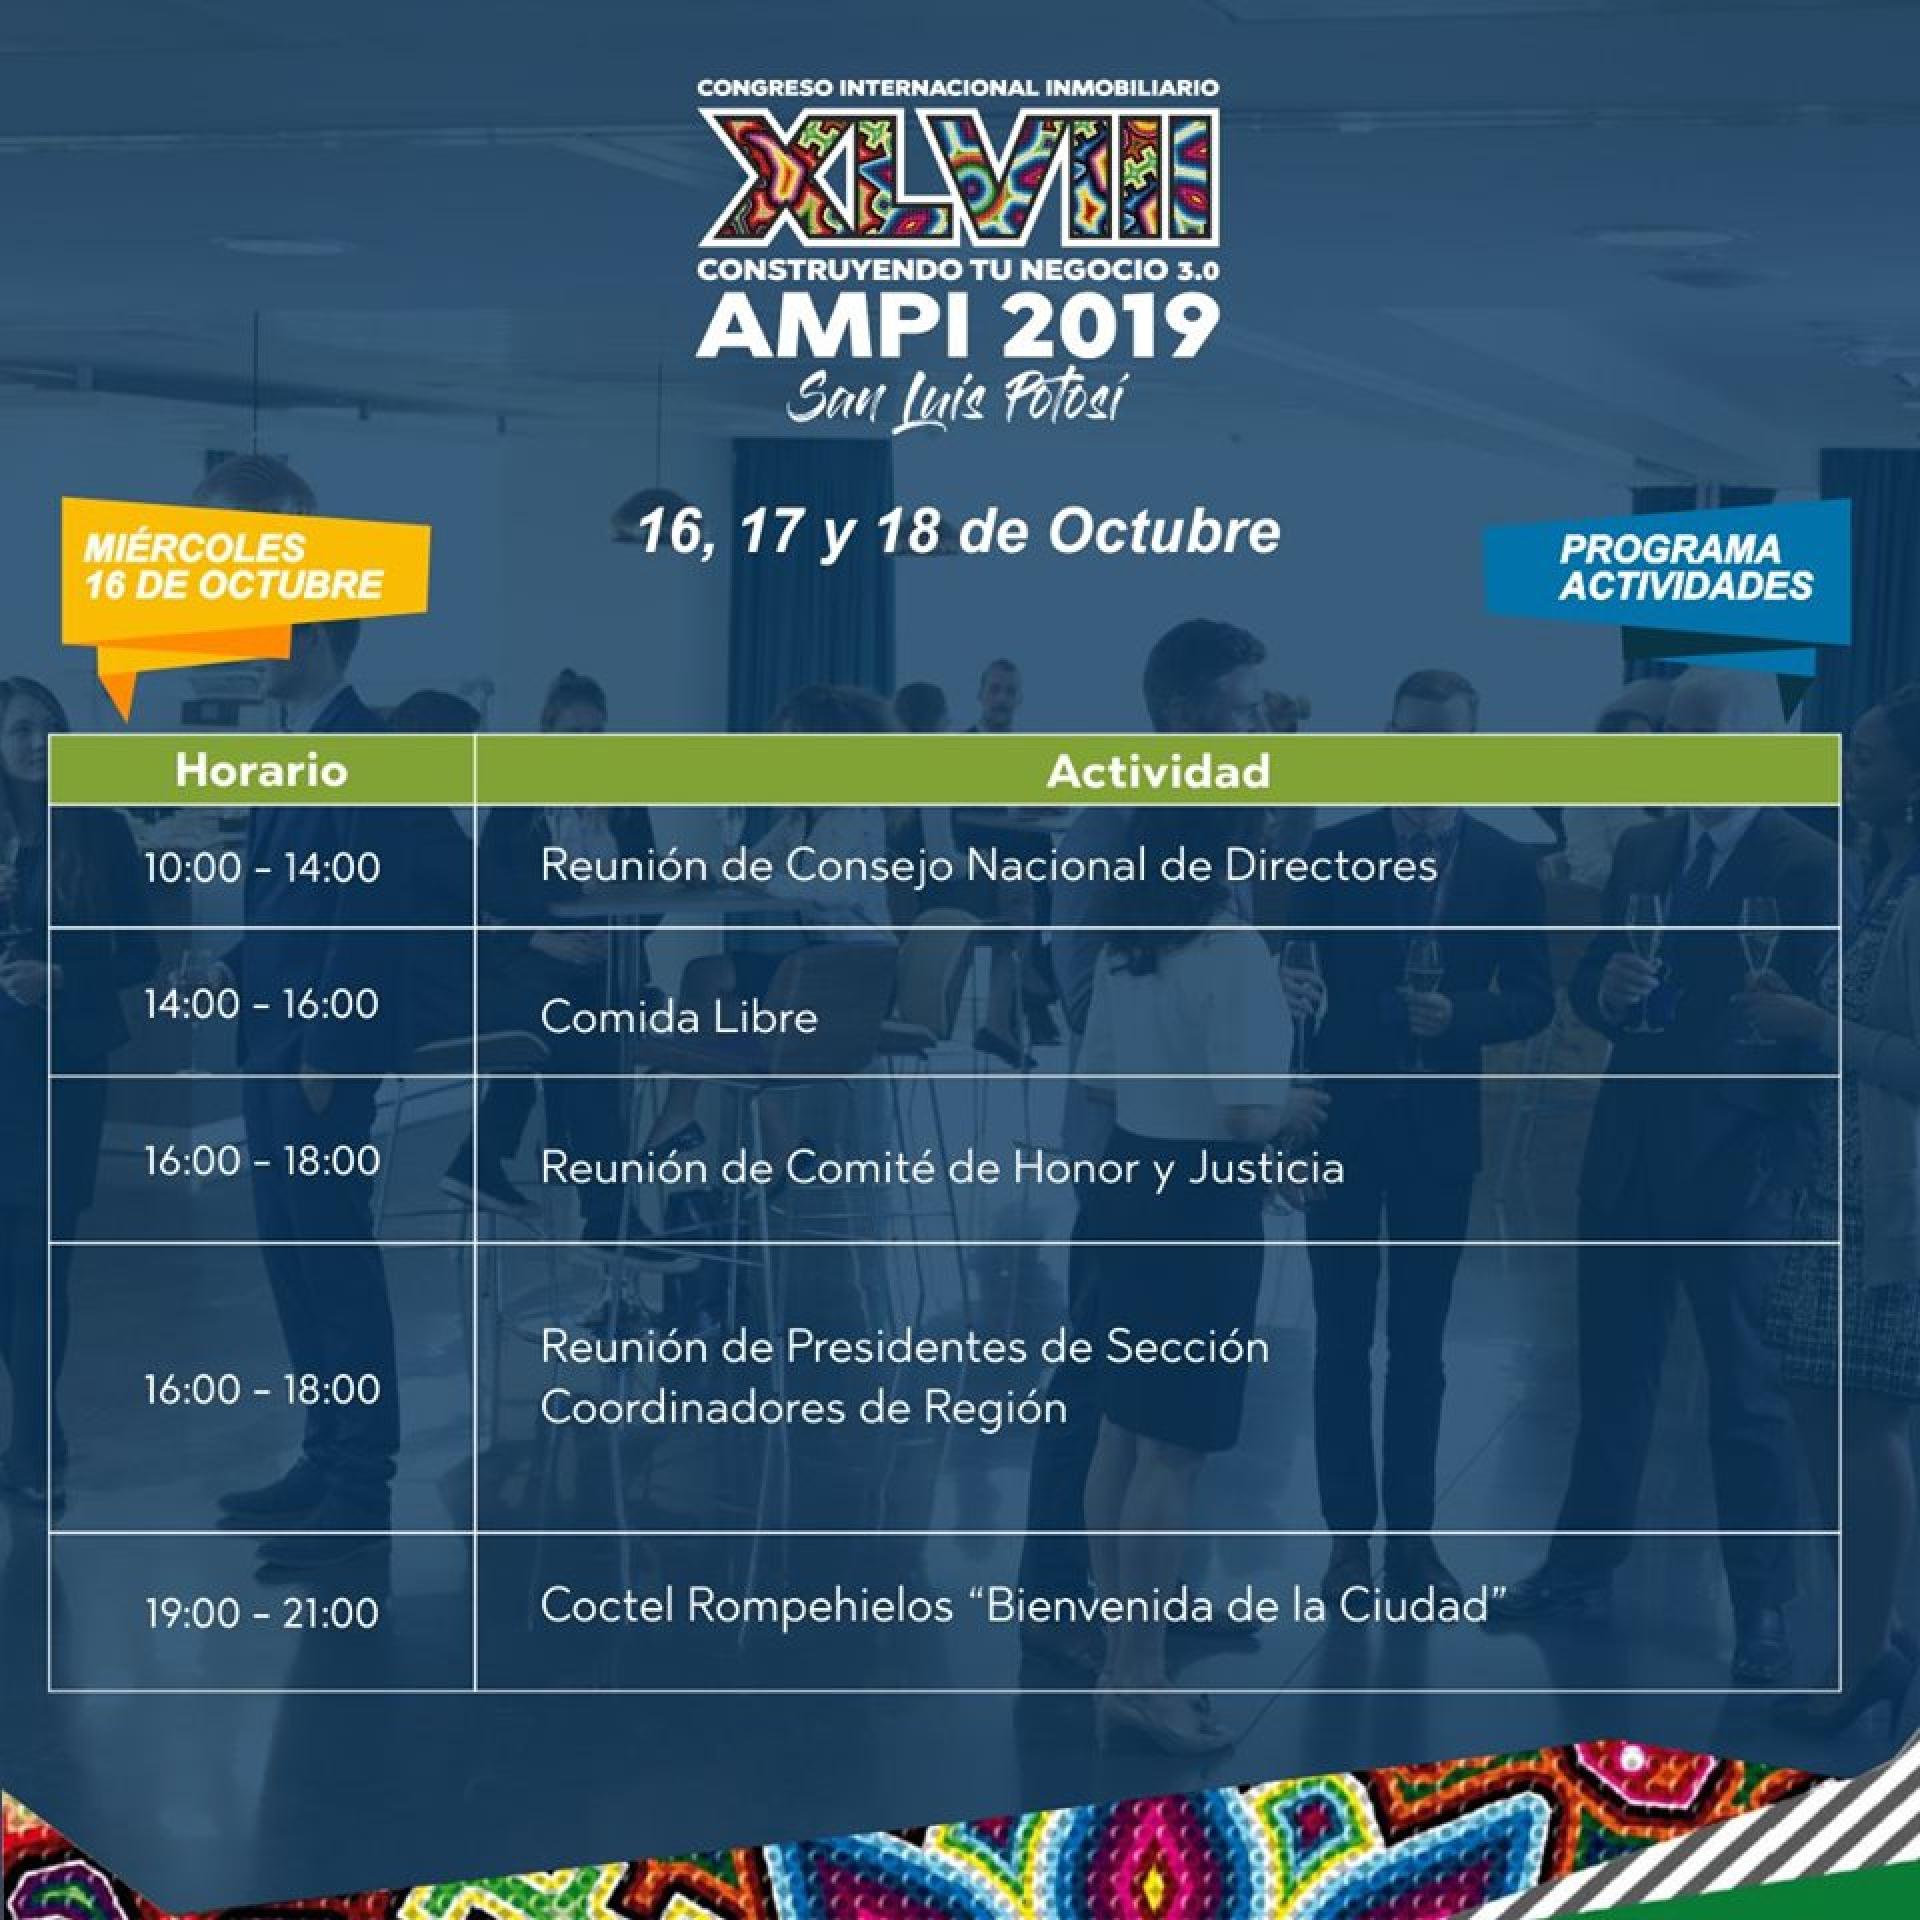 XLVIII CONGRESO INTERNACIONAL AMPI 2019